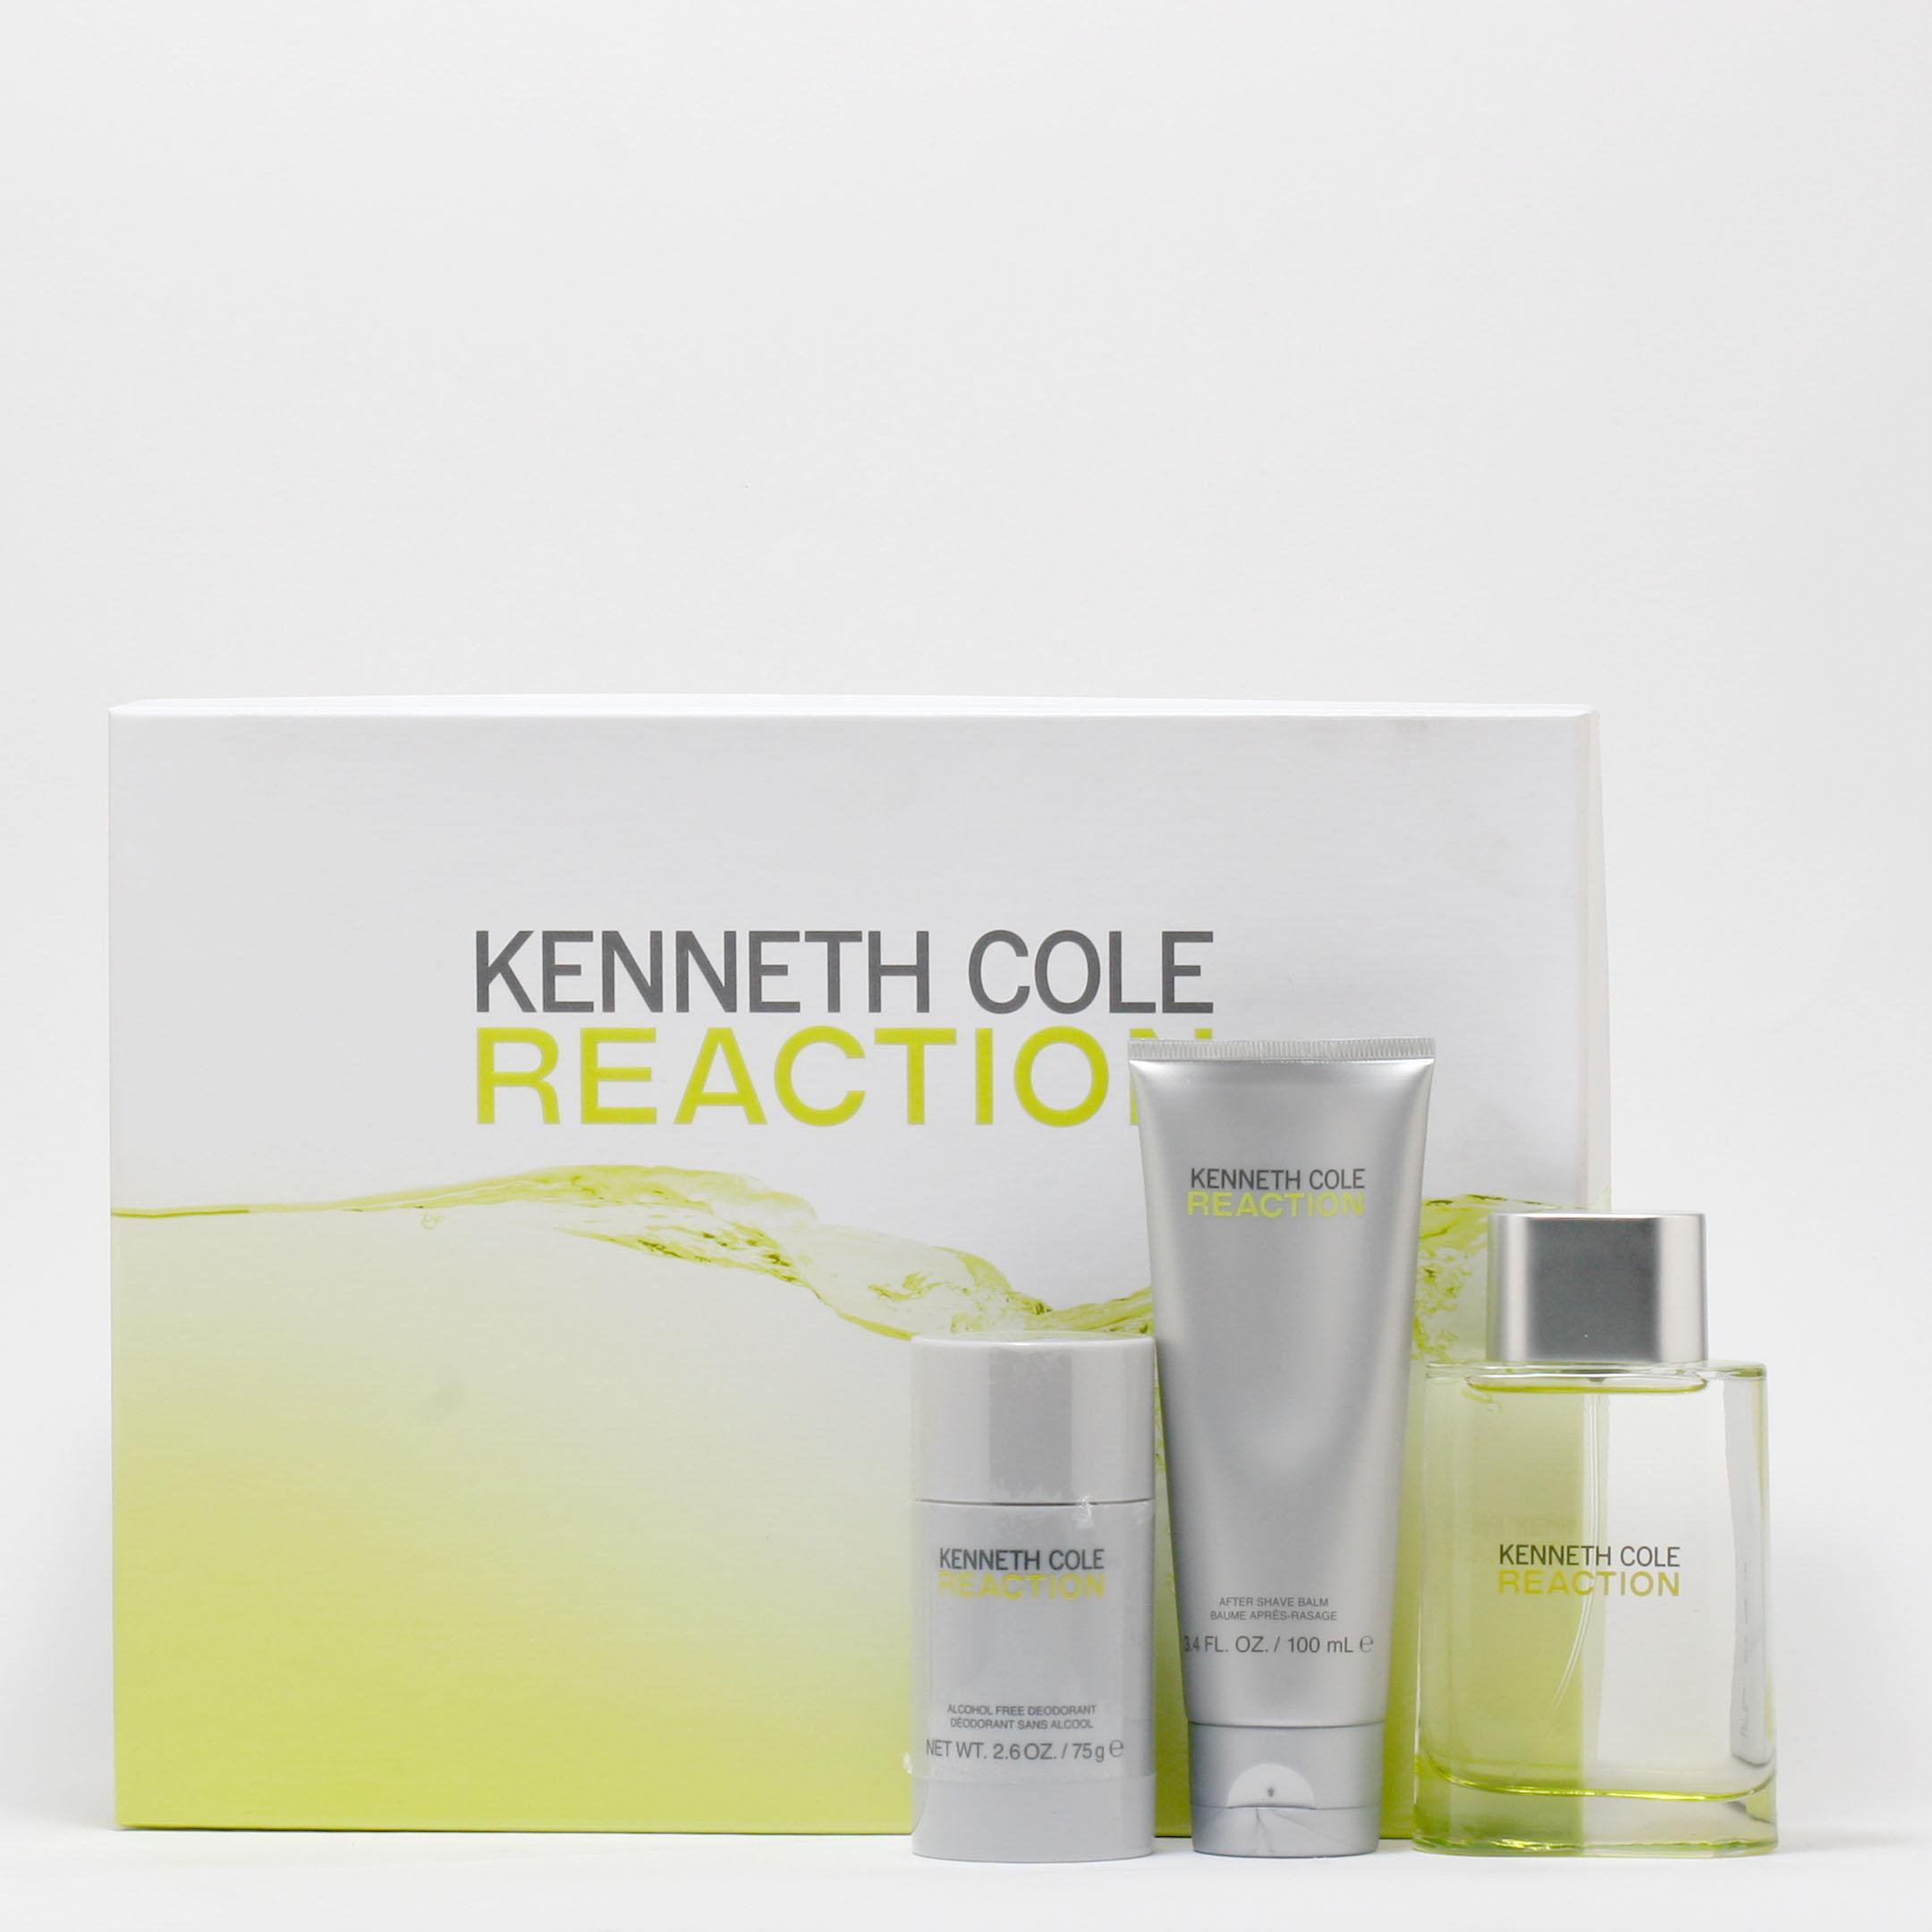 Kenneth Cole Reaction 3-Piece Set